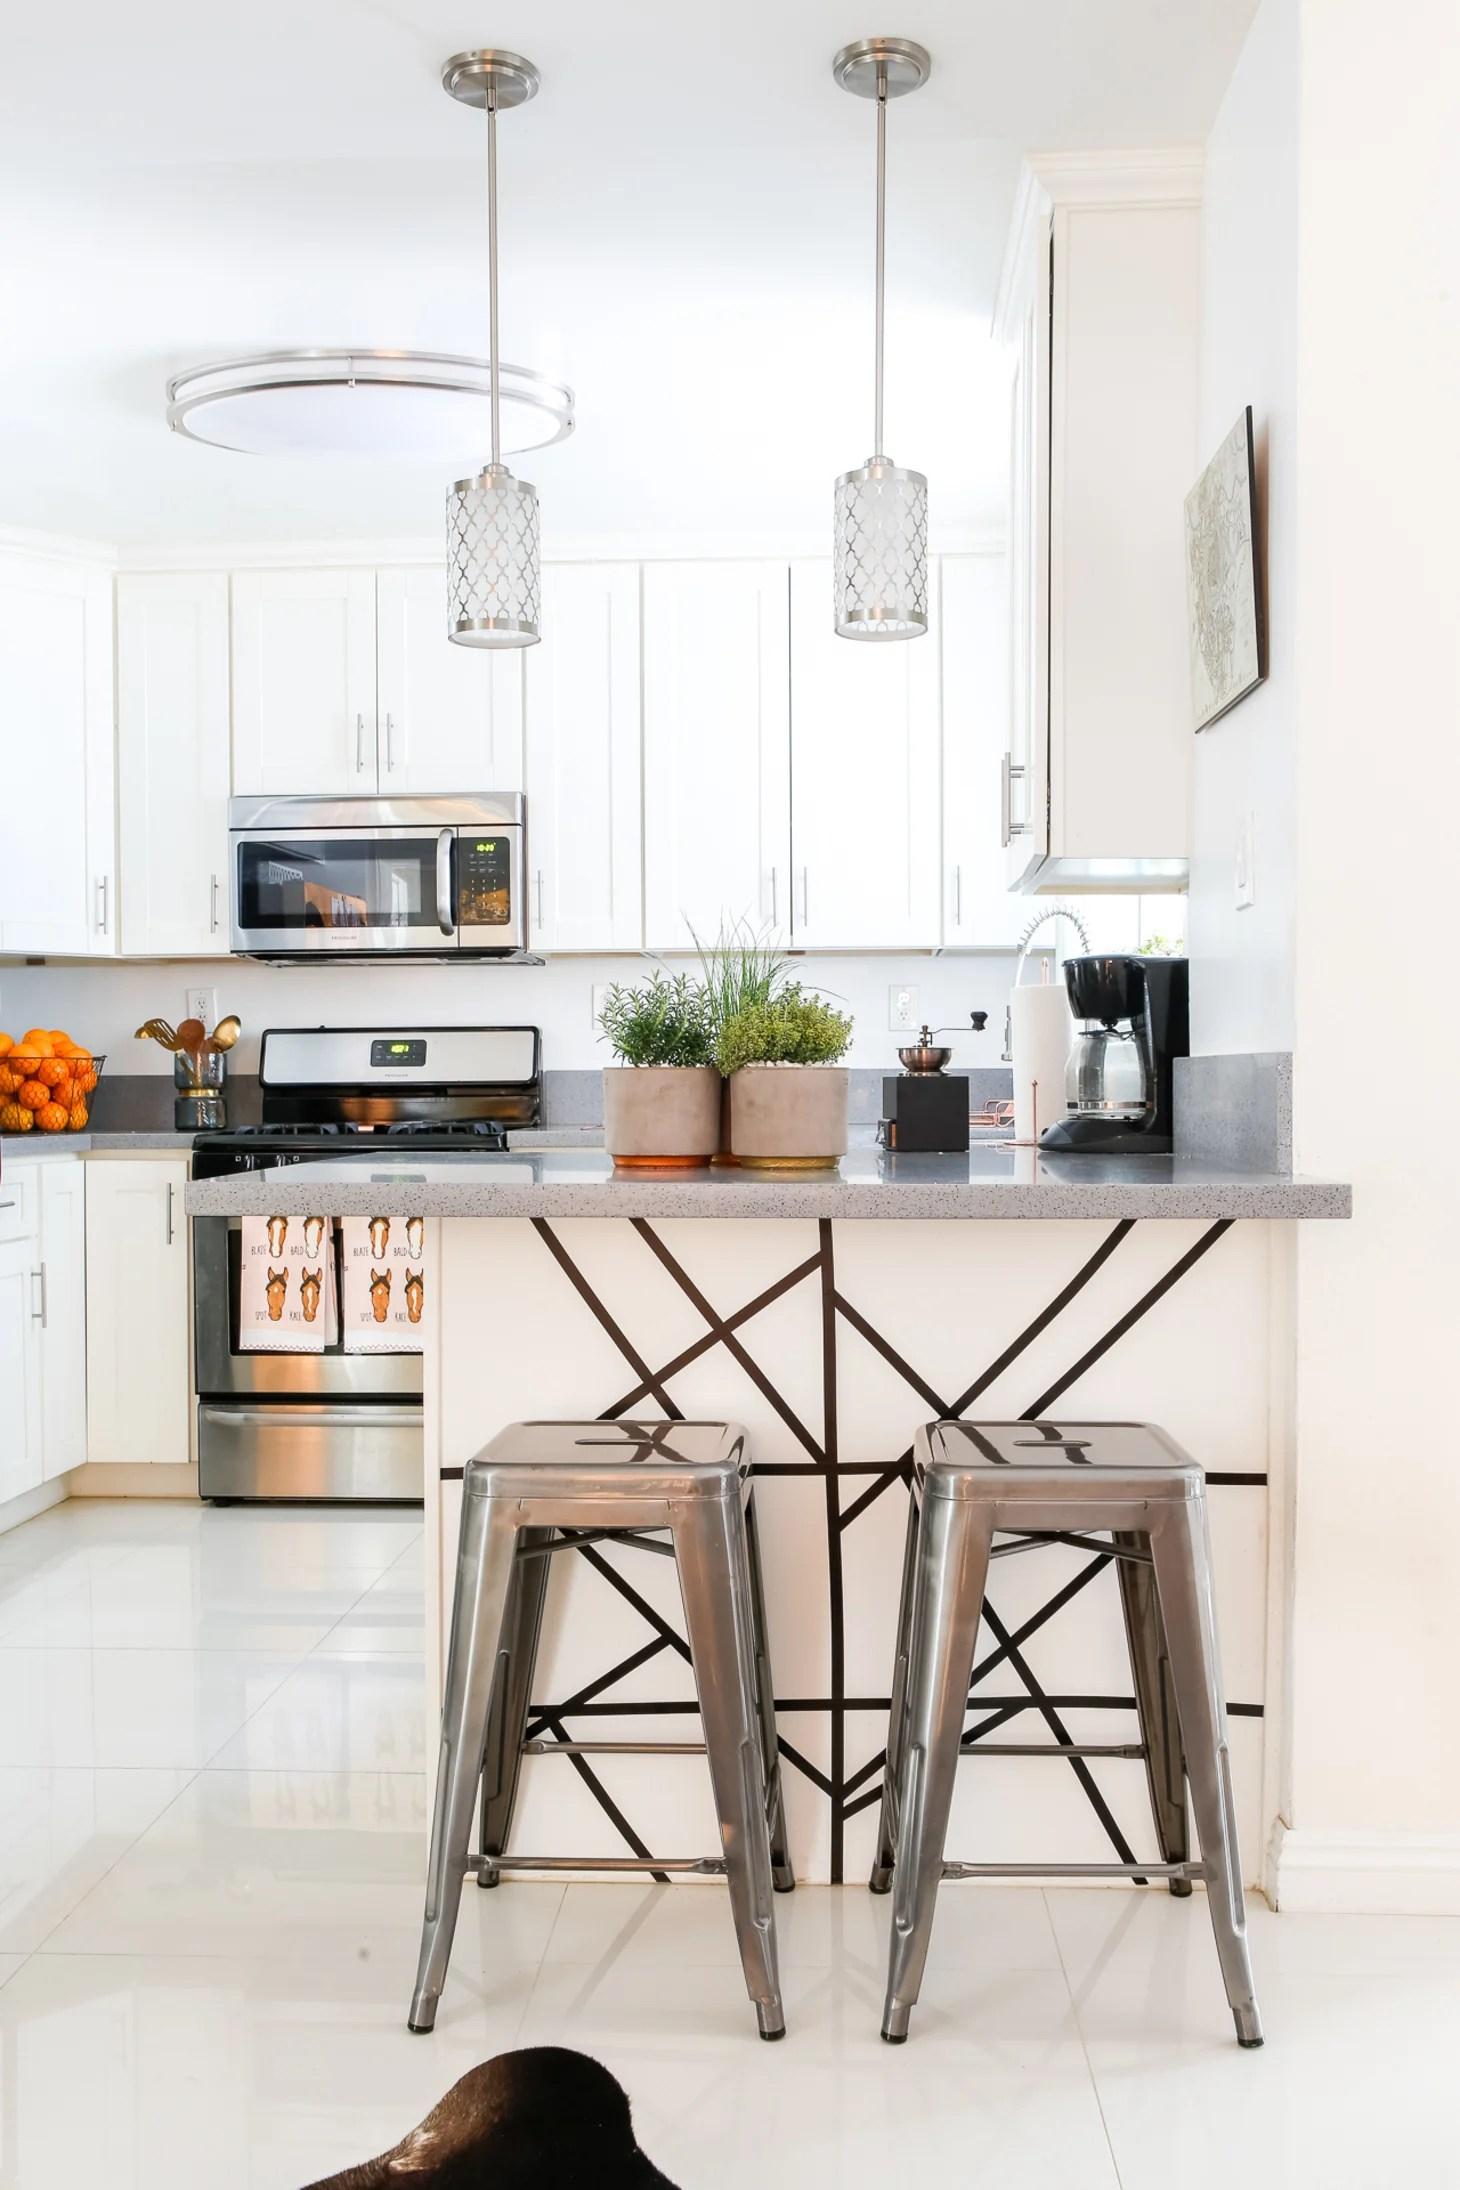 35 Best Small Kitchen Design Ideas - Decorating Small ... on Small Kitchen Ideas  id=11805